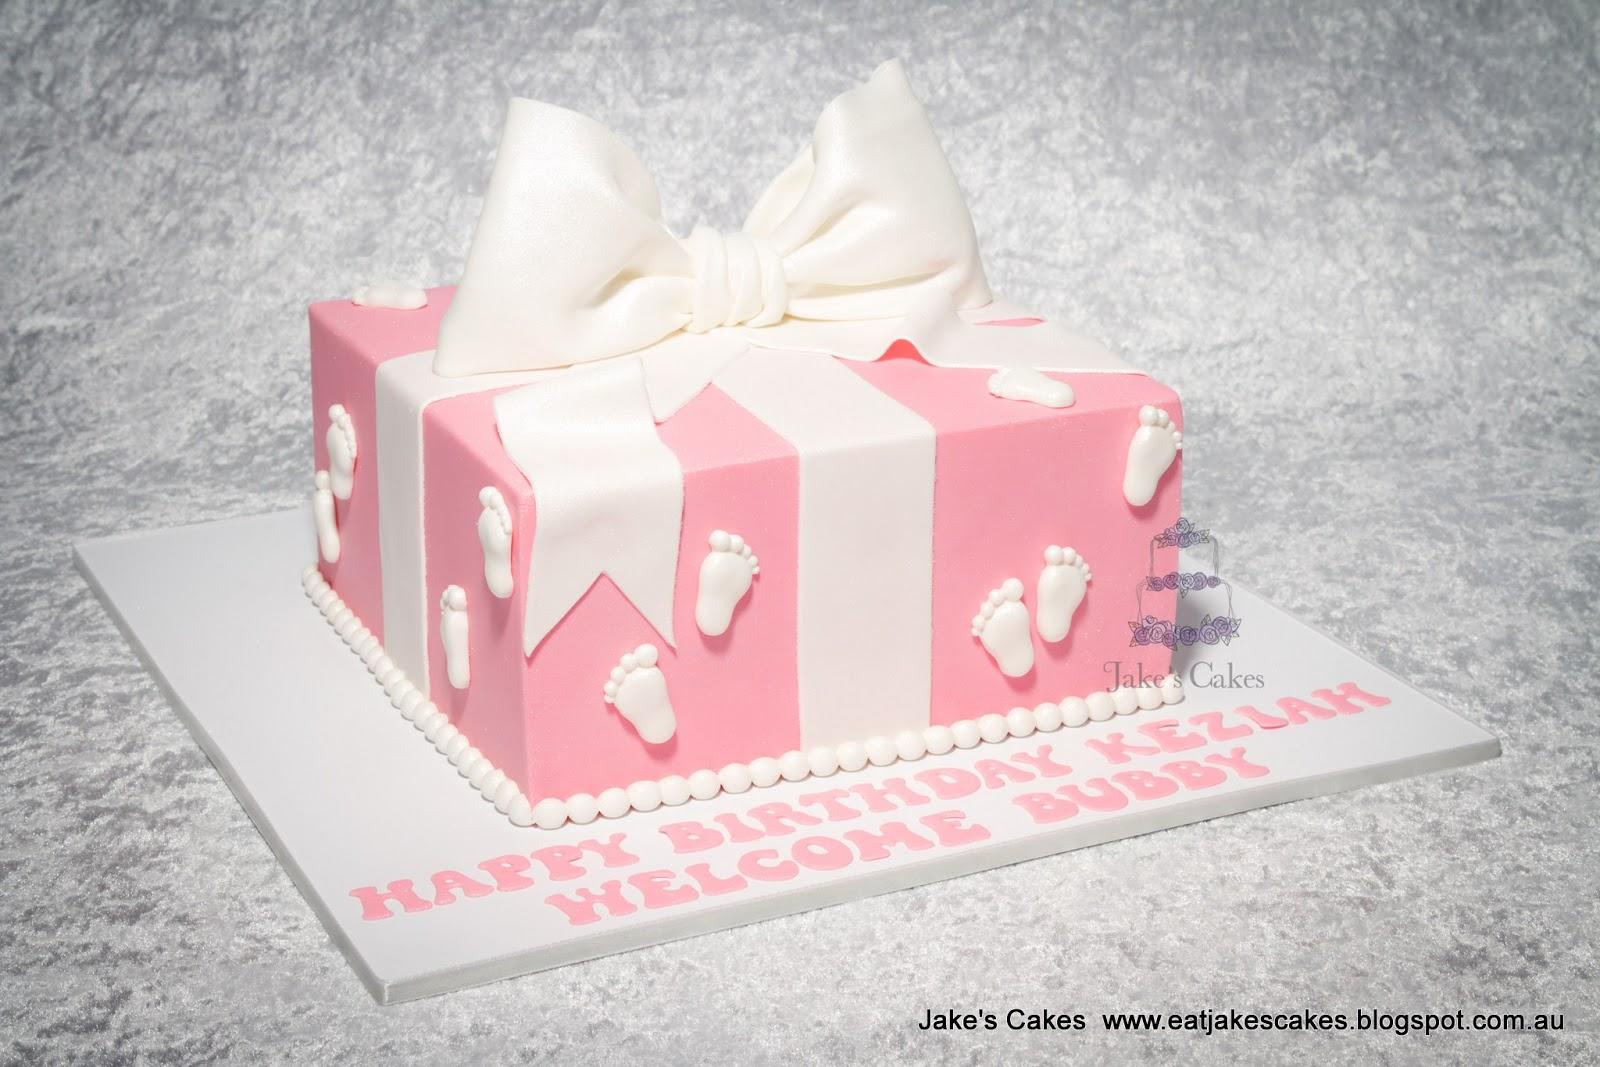 Jakes Cakes Baby Shower Birthday Present Cake